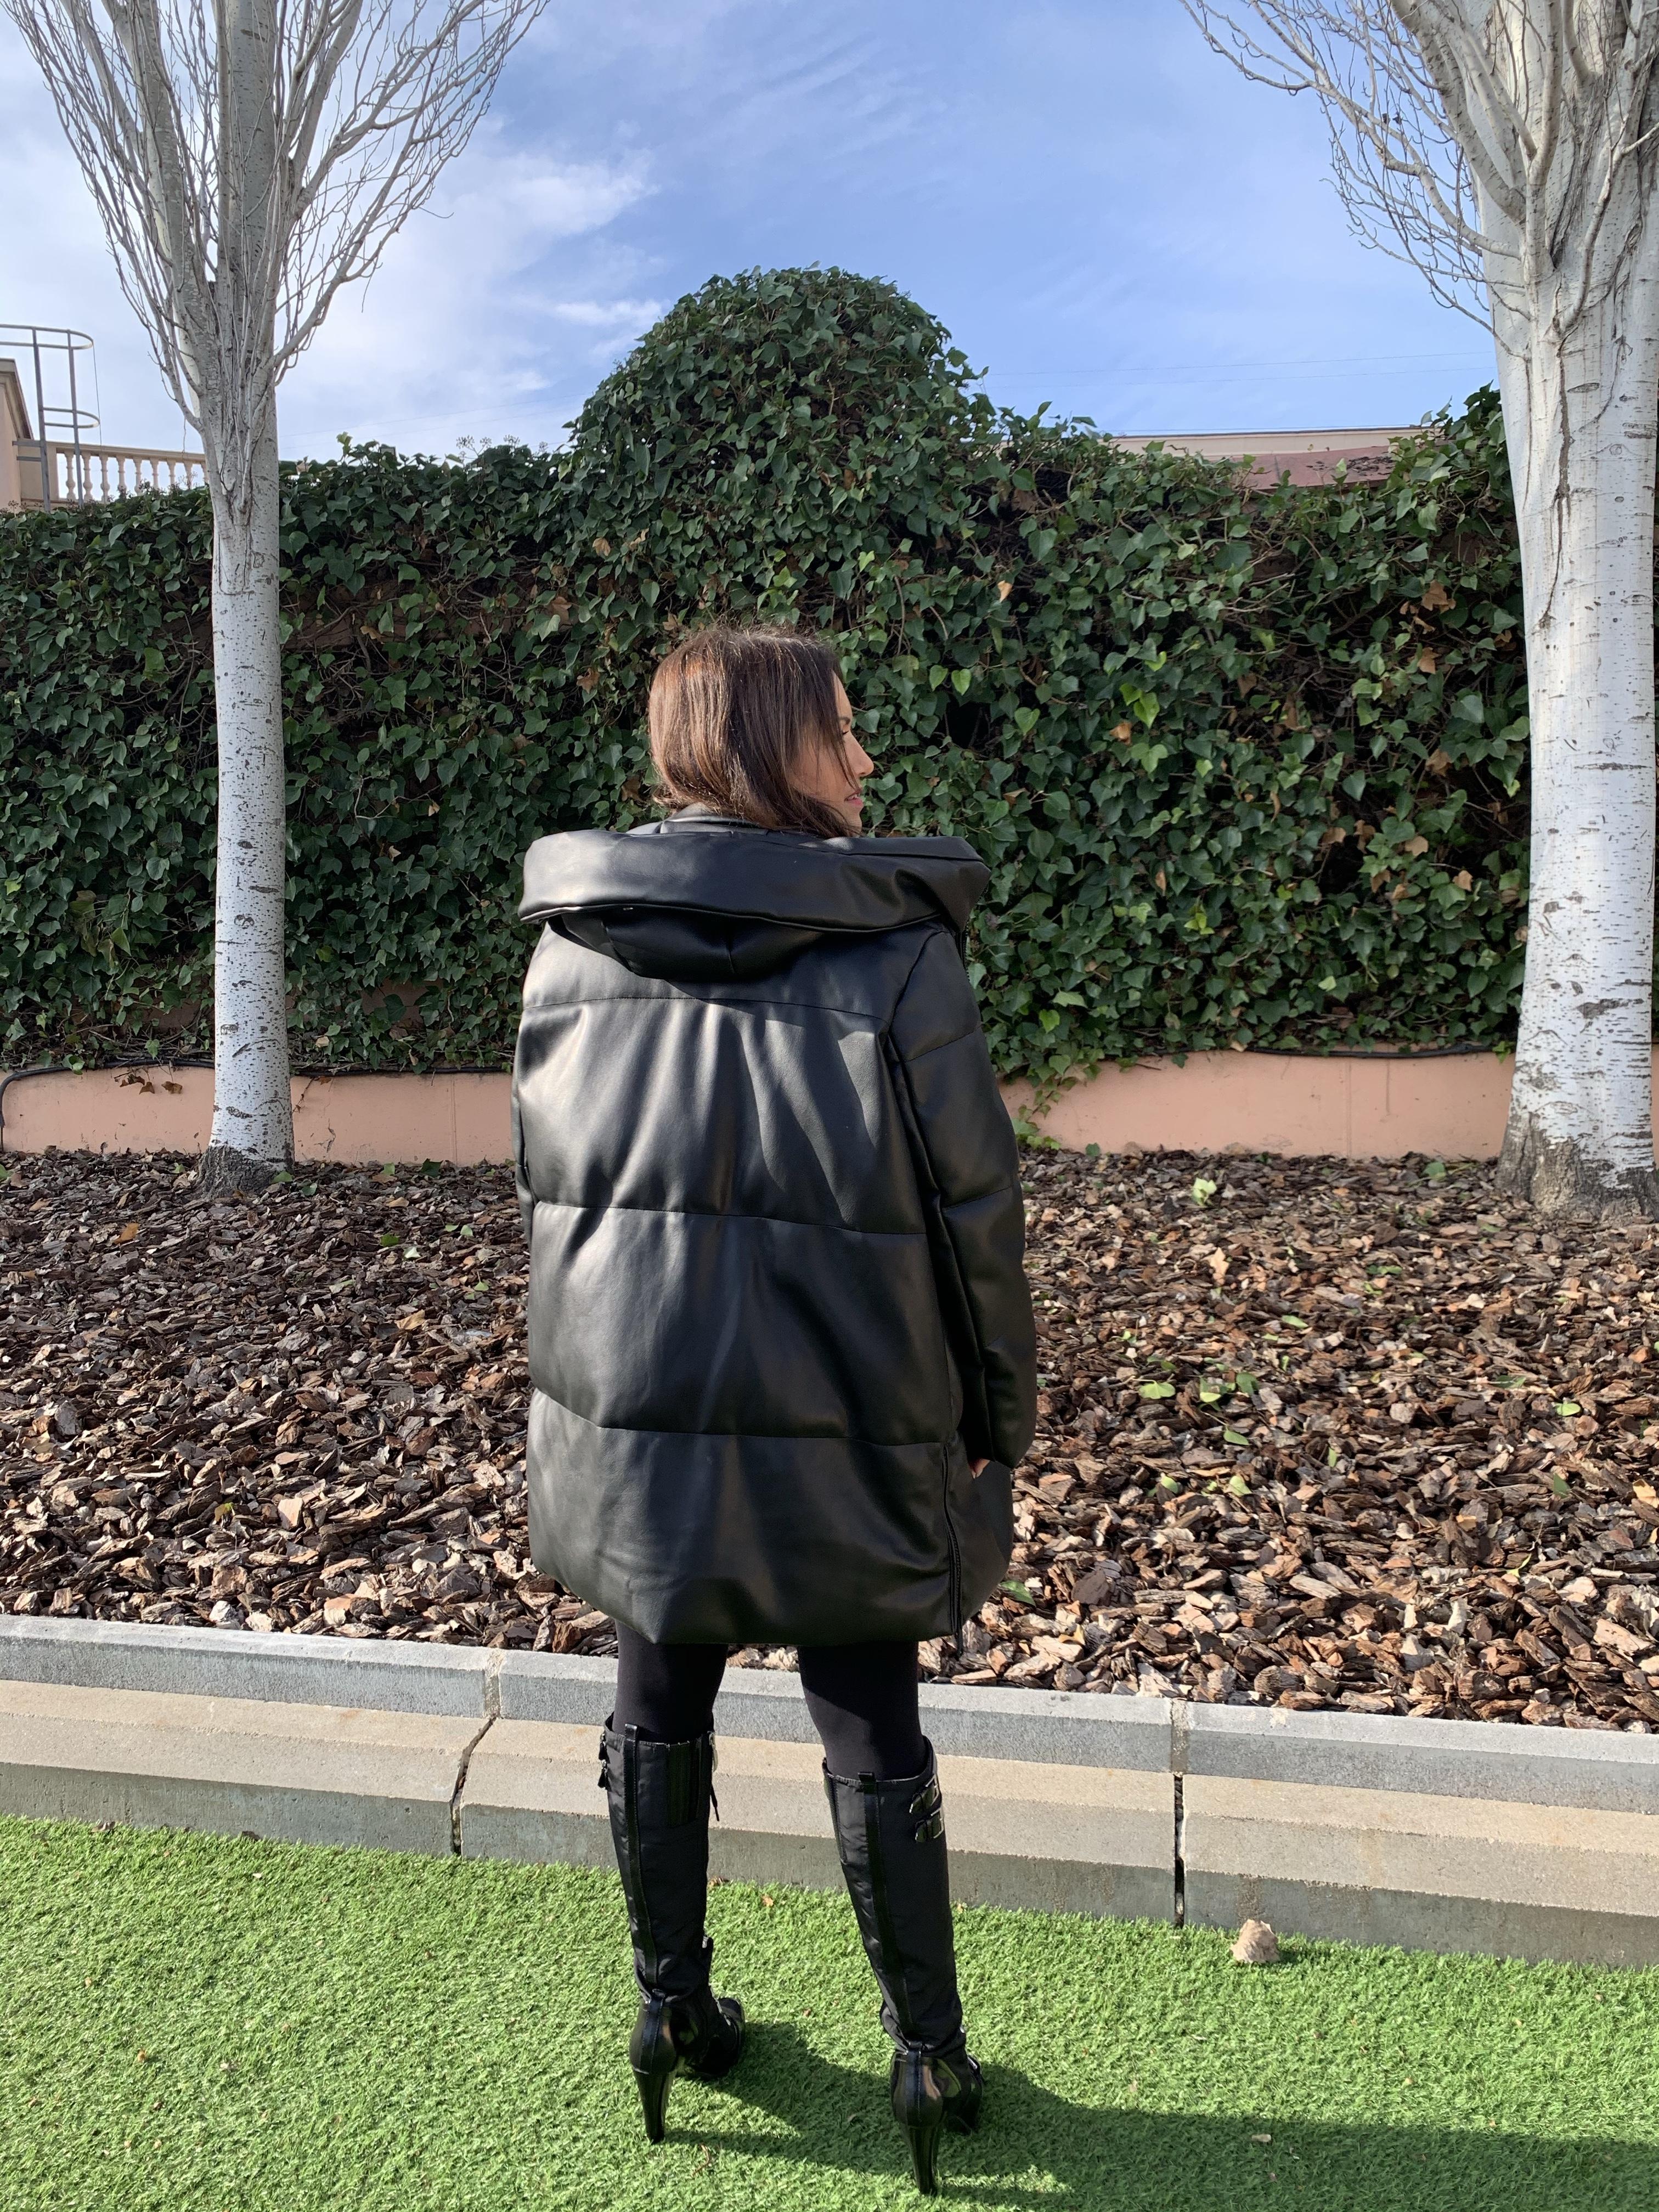 Whynot-shopper-tendencia-efecto-piel-vegana-otoño-invierno-primavera-verano-2020-street-style-must-have-blogger-Fashion-experta-moda-abrigo-oversize